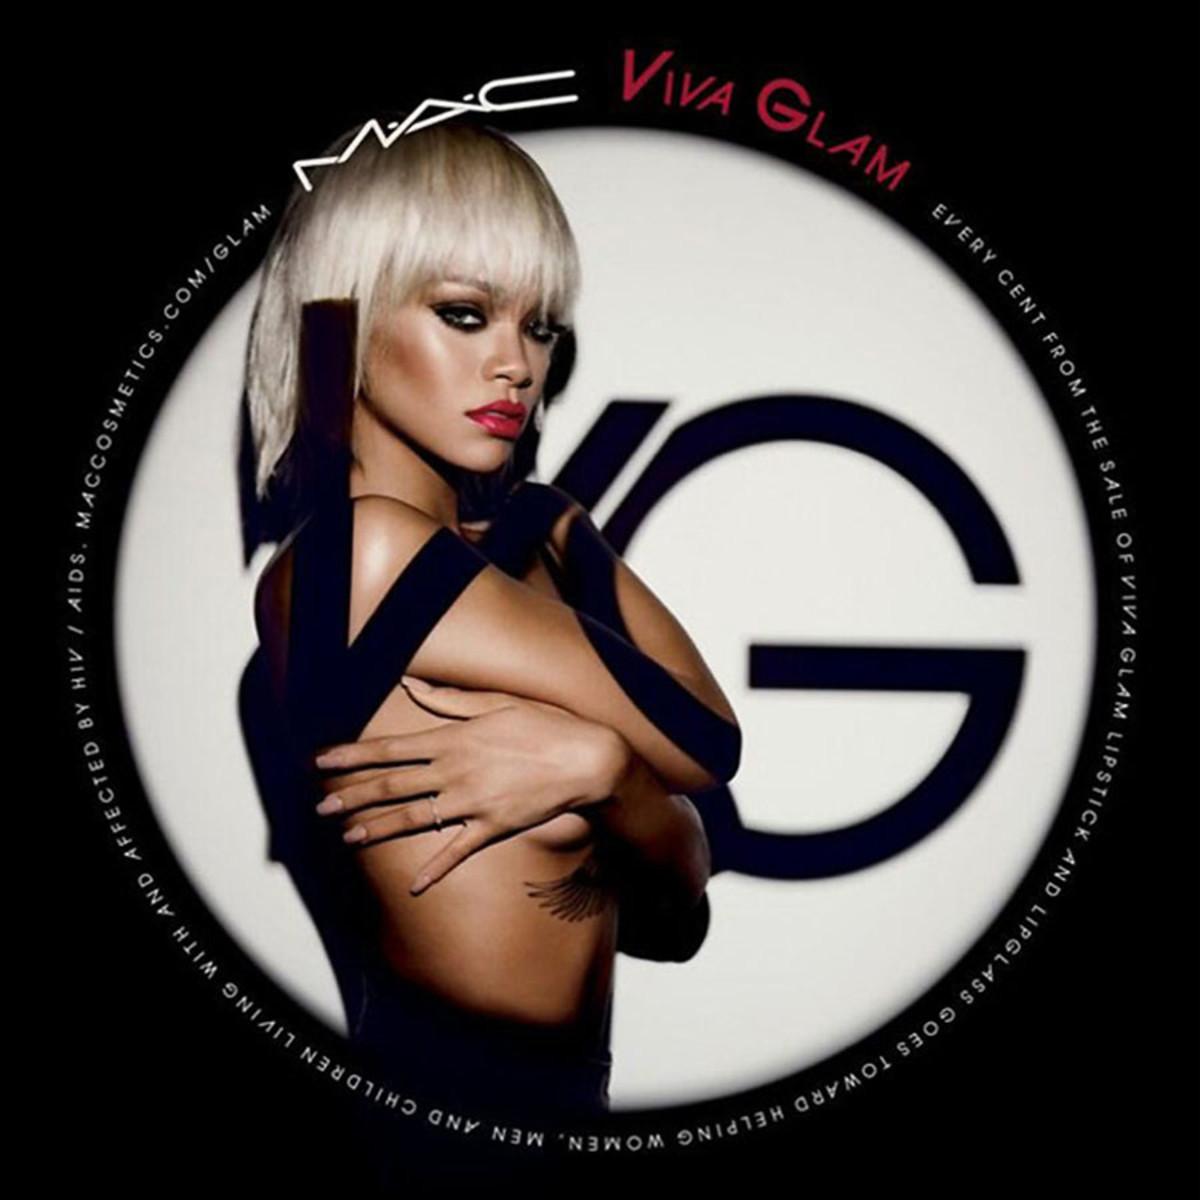 MAC Viva Glam Rihanna_beauty shot